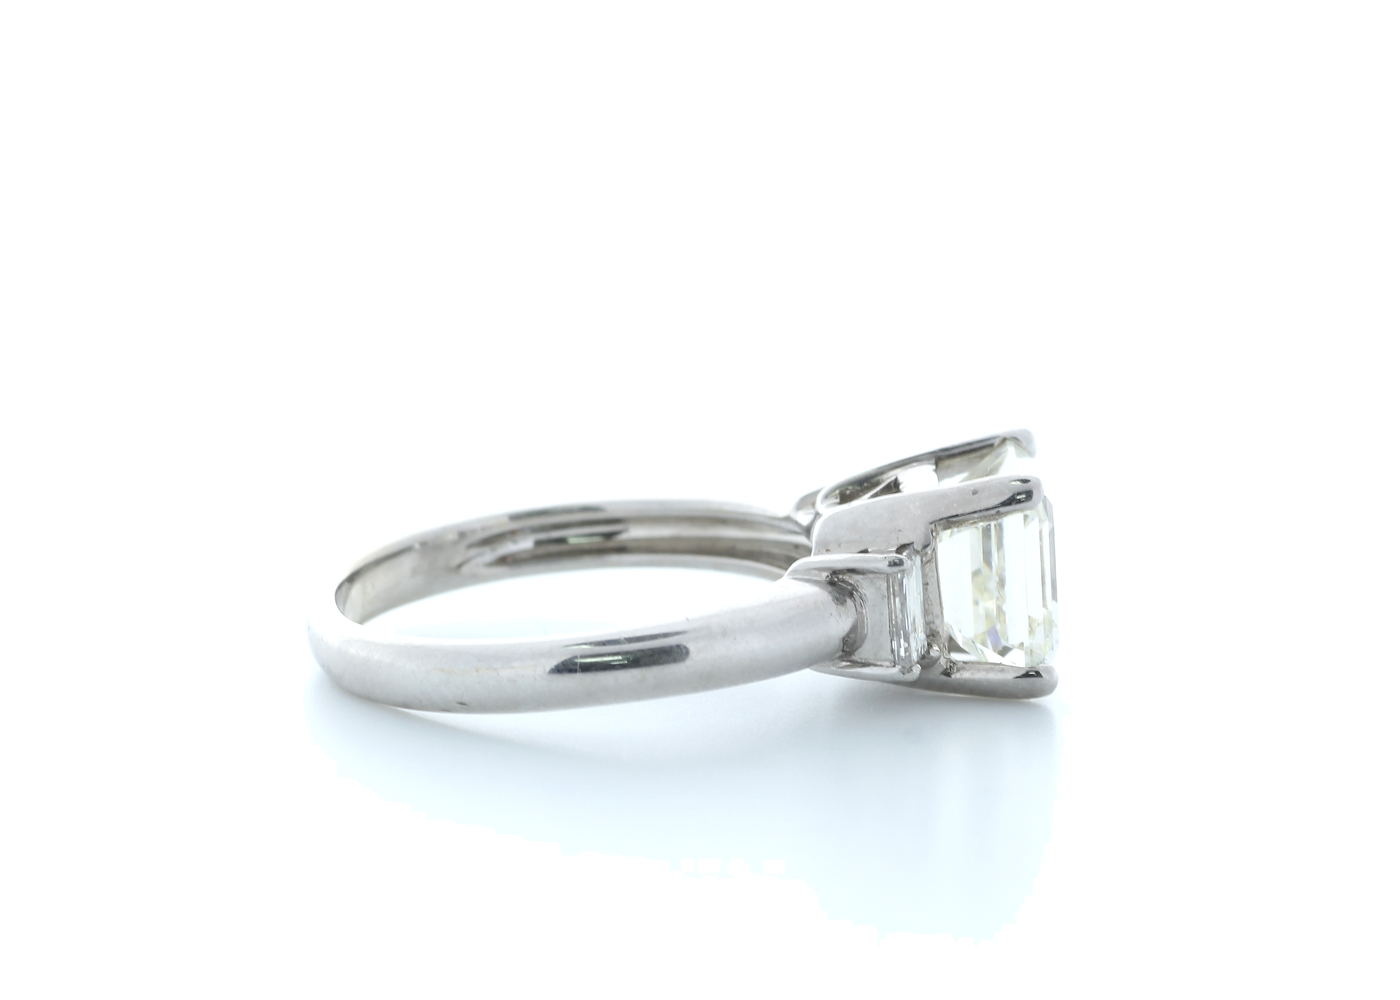 18ct White Gold Three Stone Claw Set Diamond Ring 3.11(2.70) Carats - Image 4 of 5